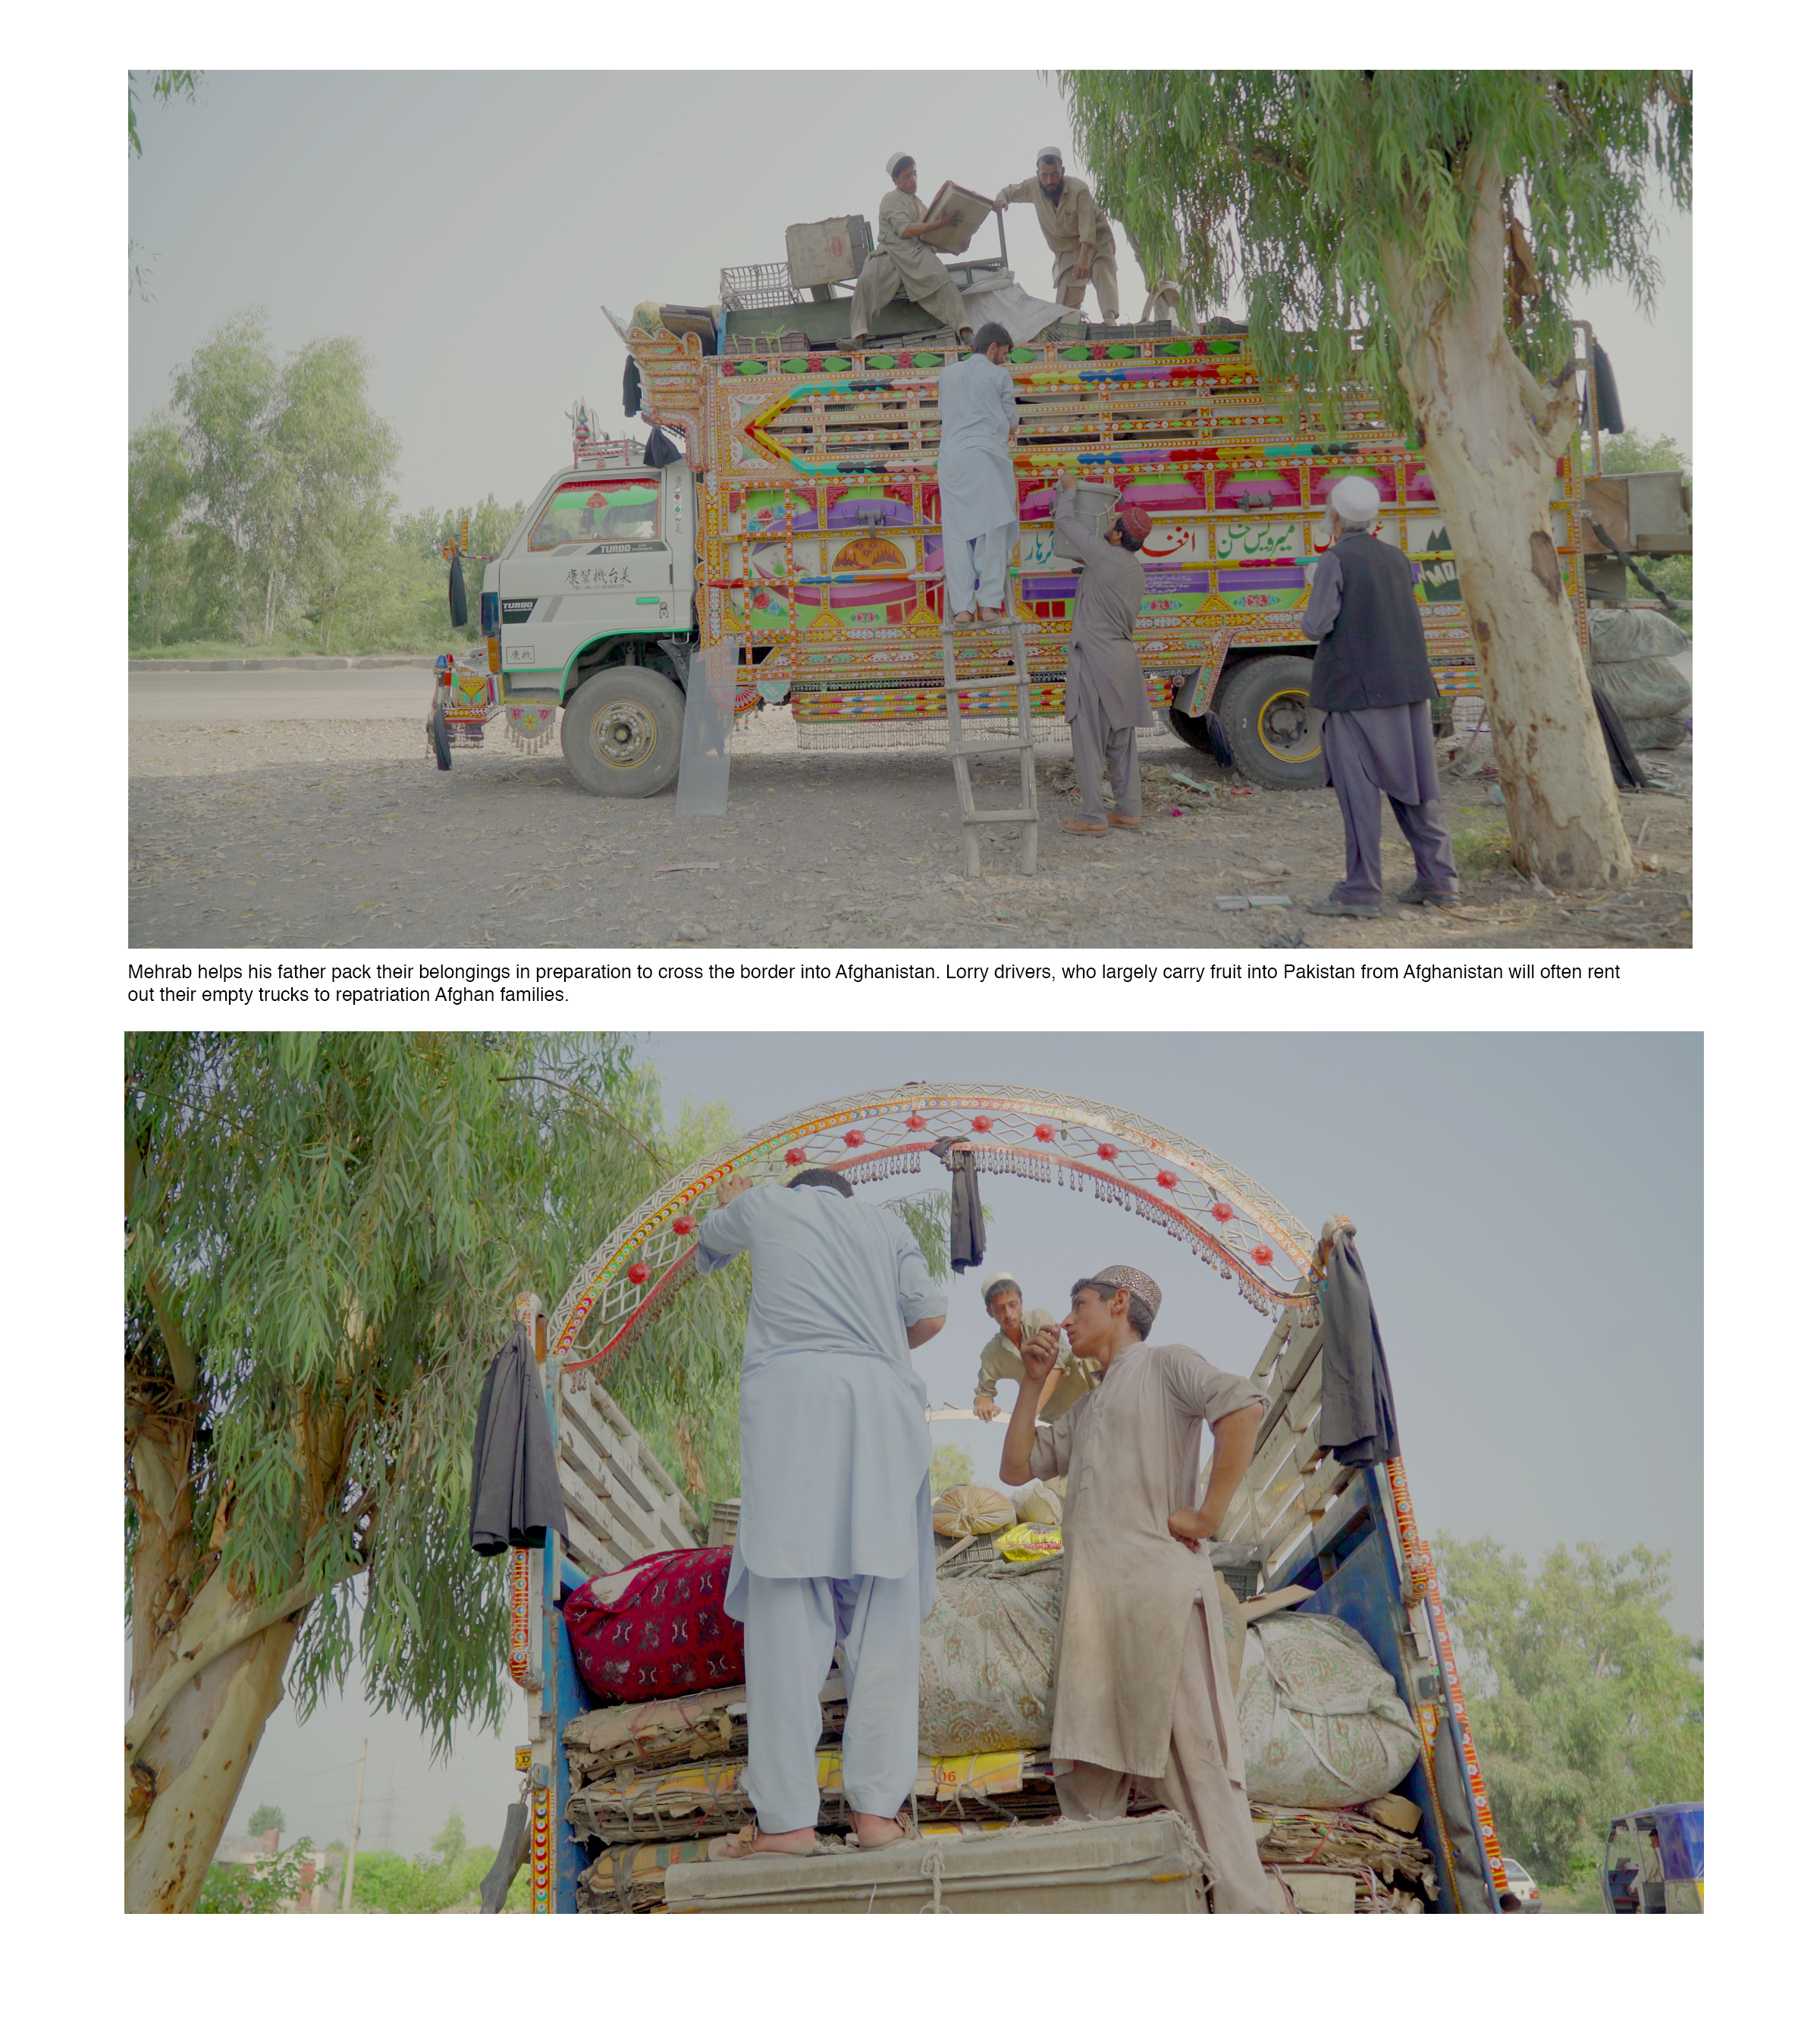 02_Pakistan pg2.jpg